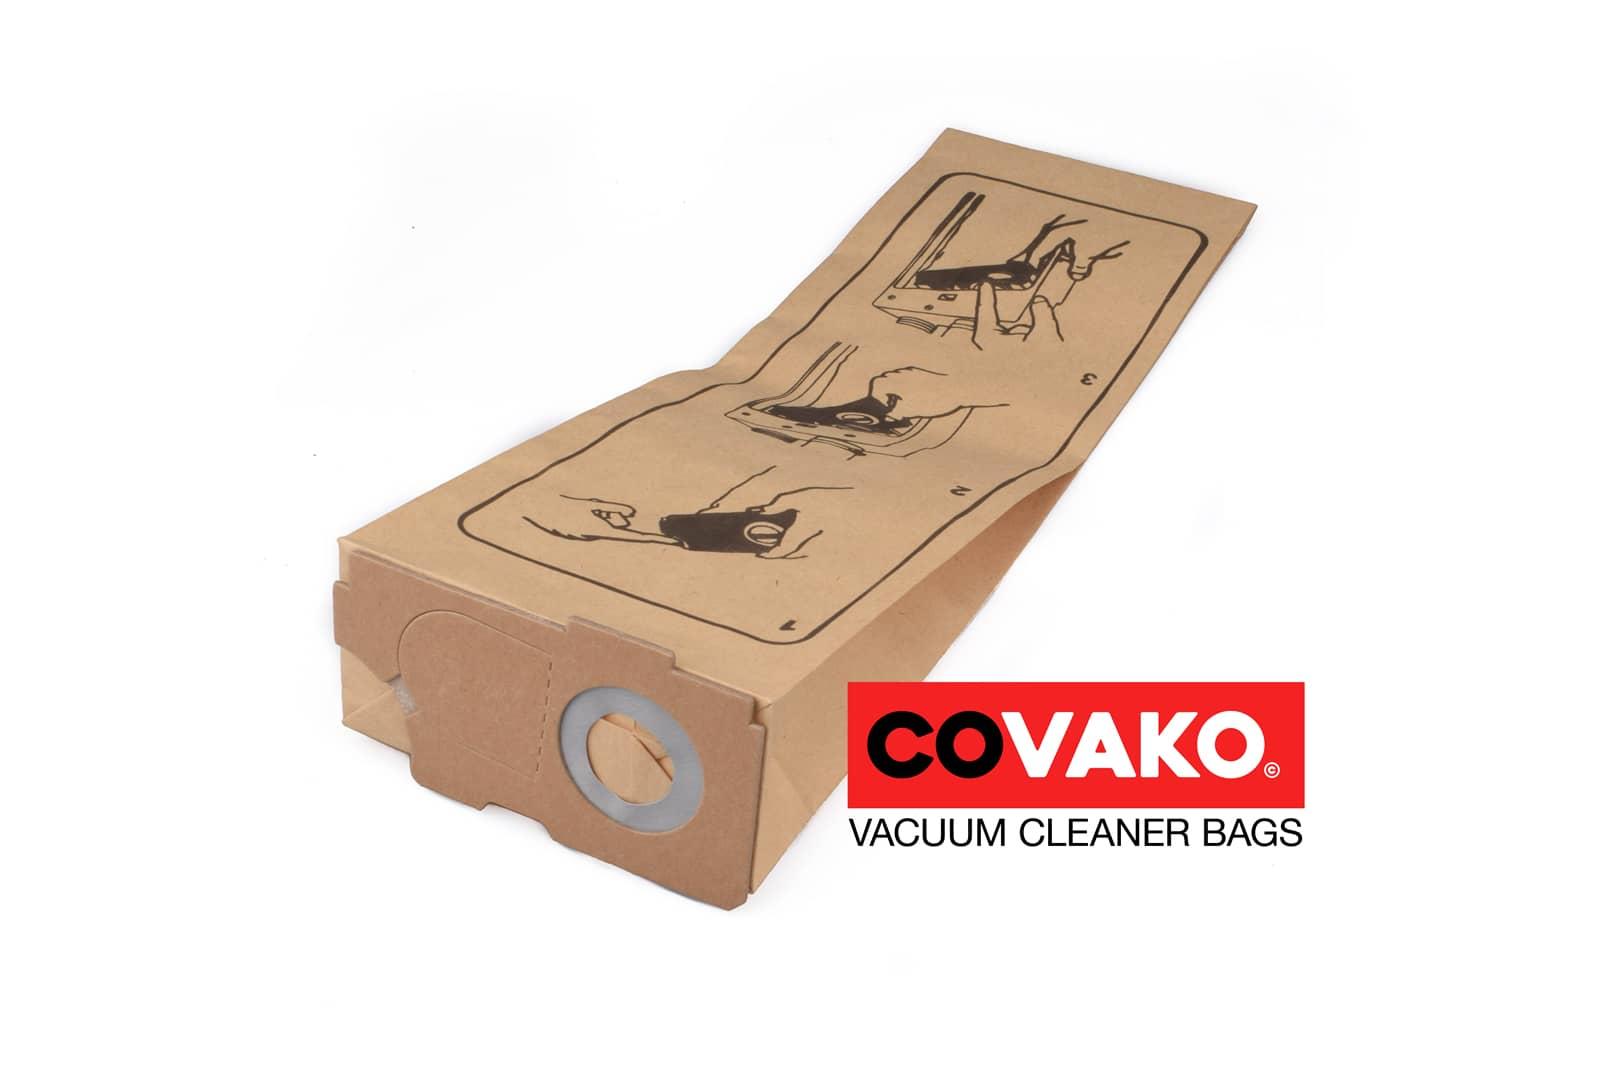 Ivac Comfort 36 / Papier - Ivac stofzuigerzakken